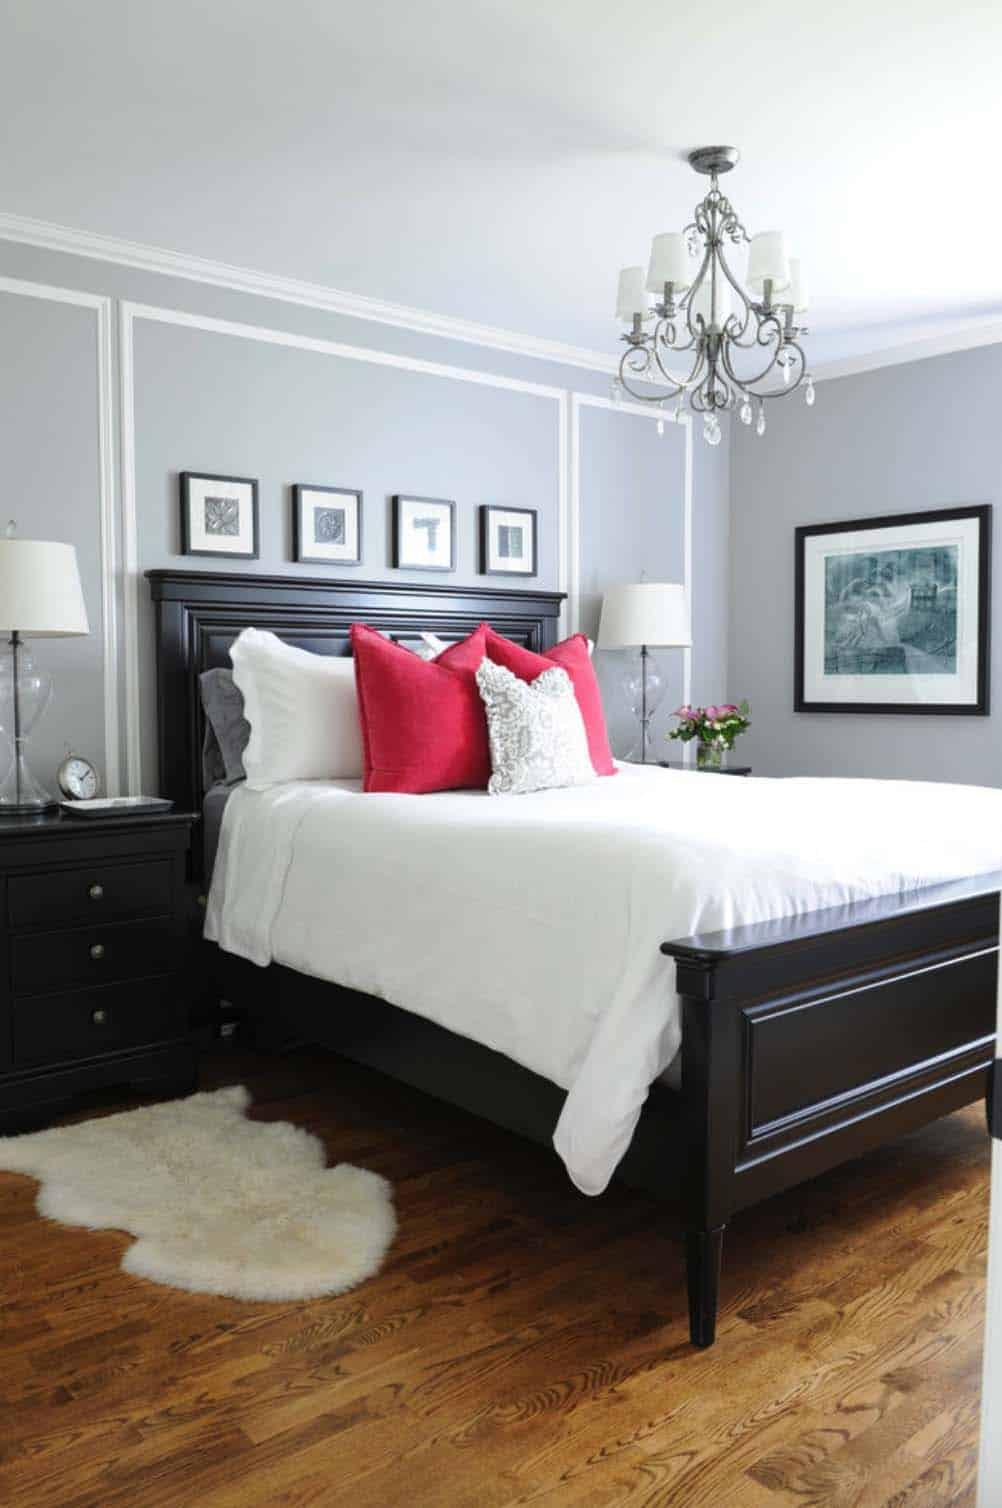 thomasville benjamin sofa dual reclining covers 30+ small yet amazingly cozy master bedroom retreats